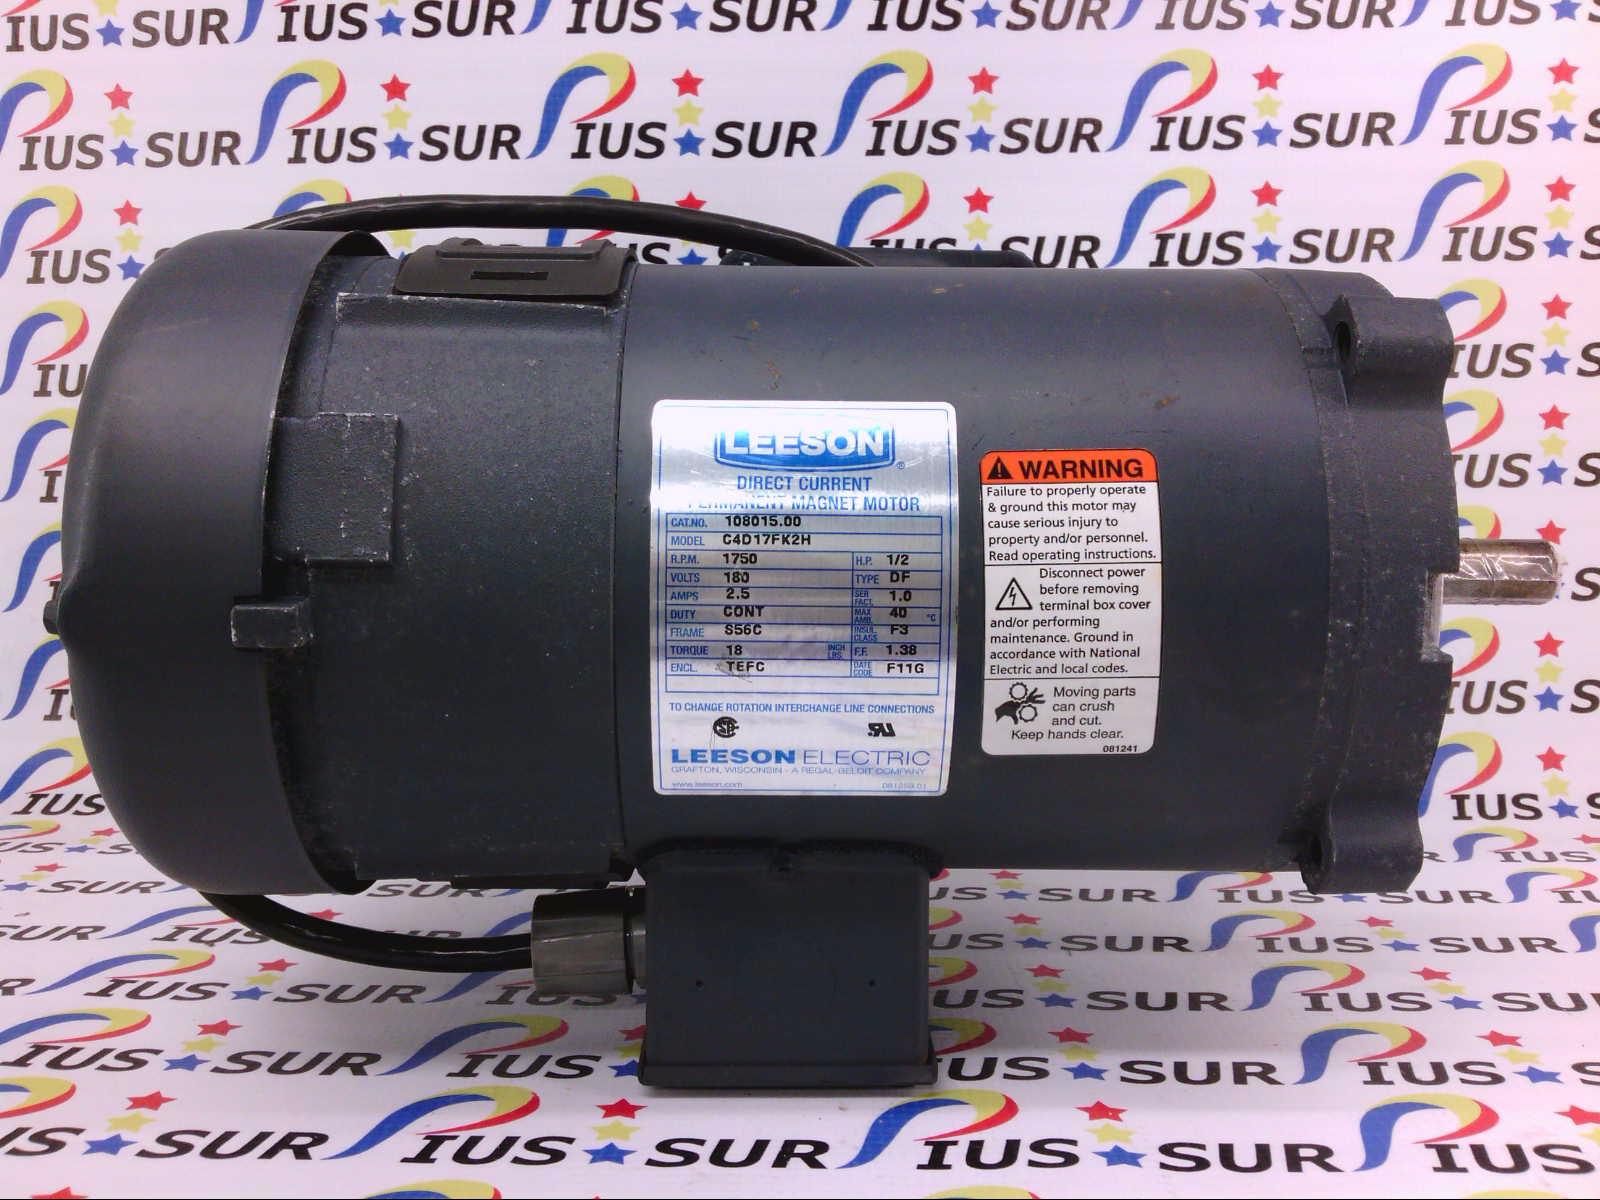 Leeson 108015 00 DC Permanent Magnet Motor C4D17FK2F 1/2HP 1750RPM TEFC DF  Electric Continuous Duty